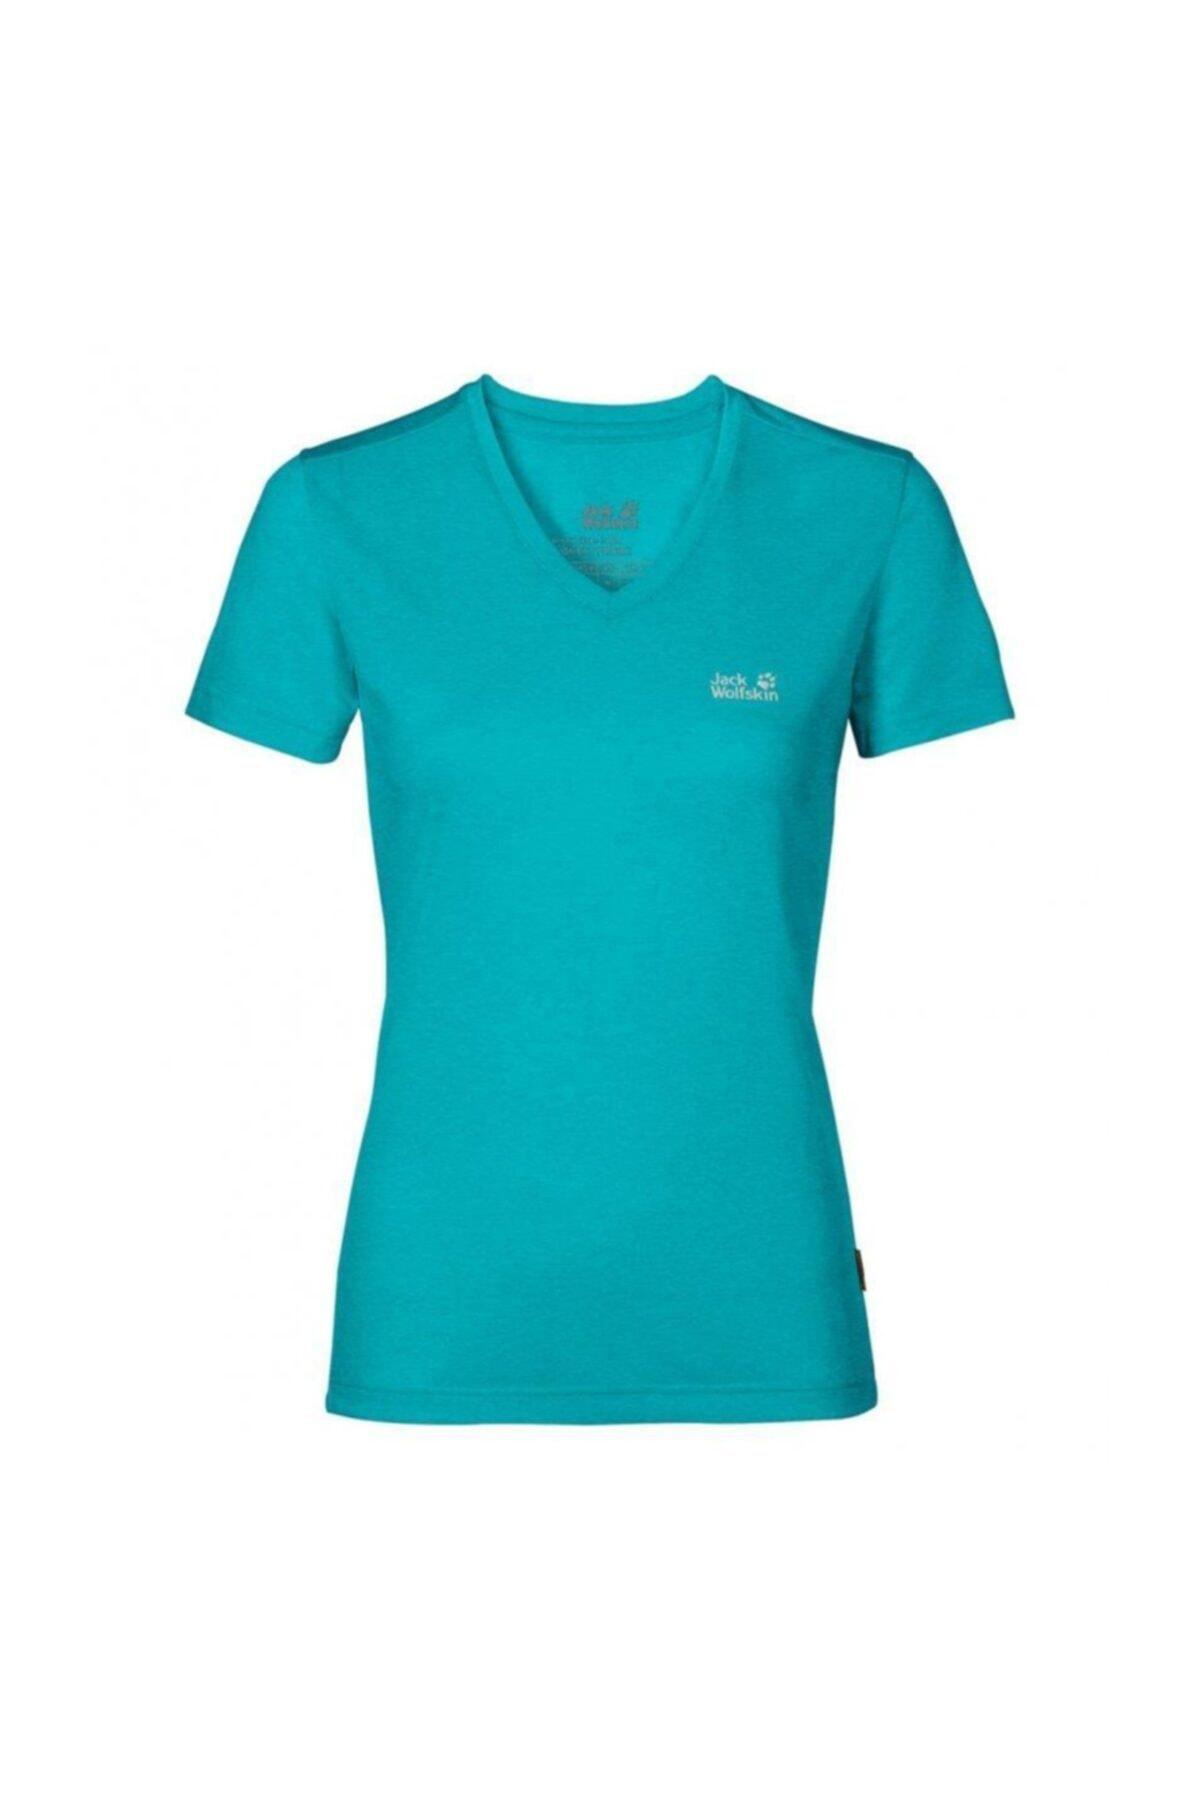 Jack Wolfskin Crosstrail Kadın T-shirt - 1801692-1105 1